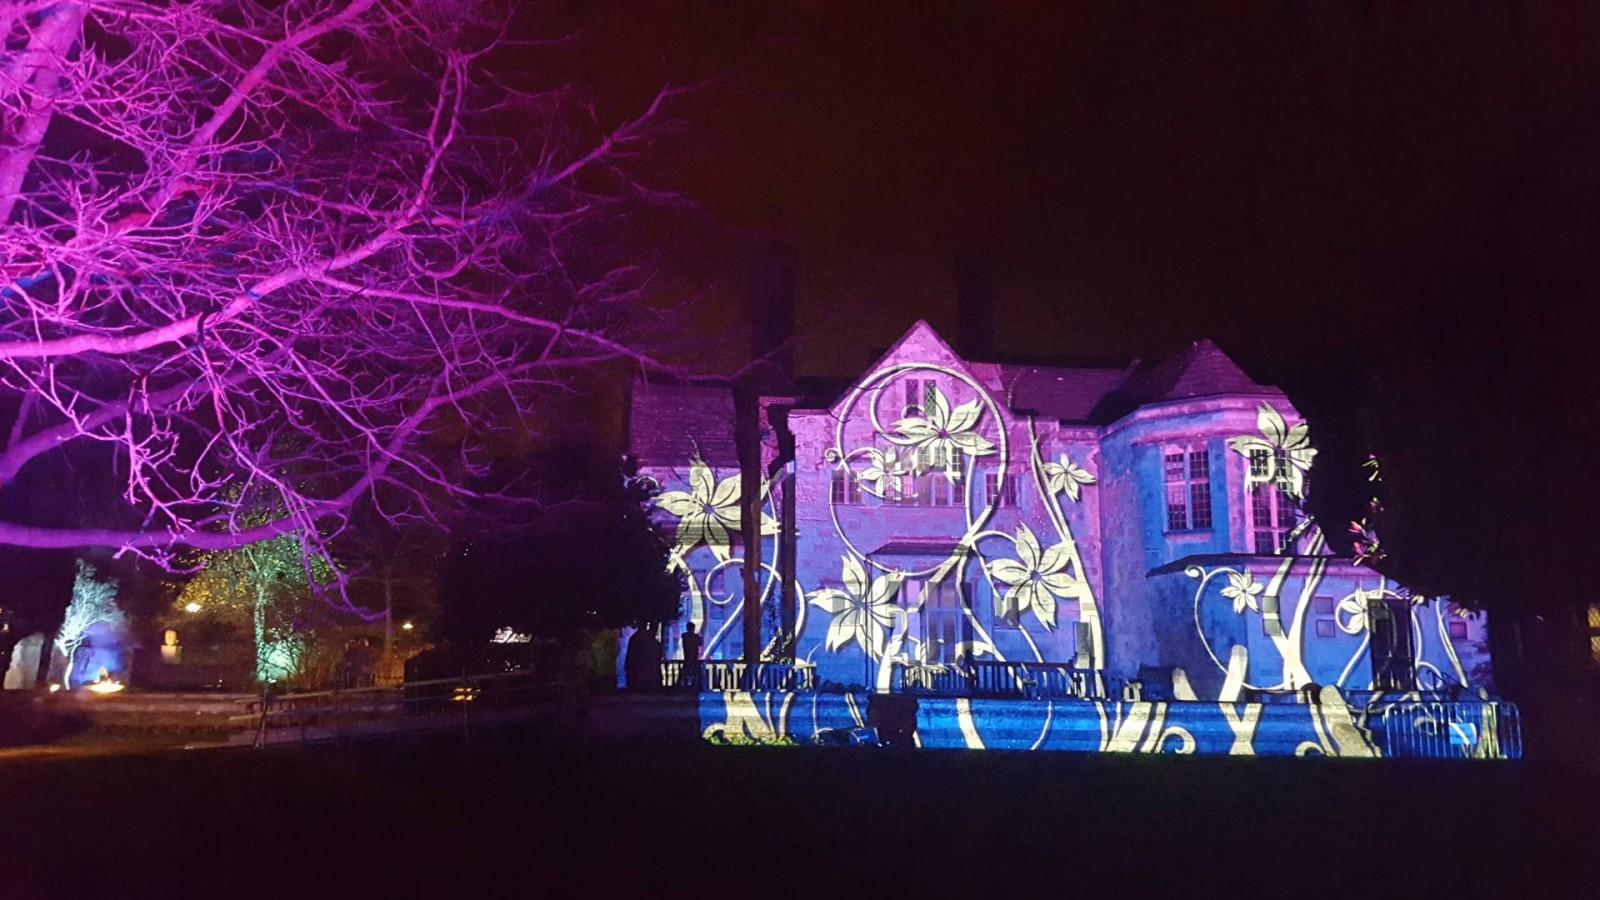 A magical night at Enchanted Park Lewes